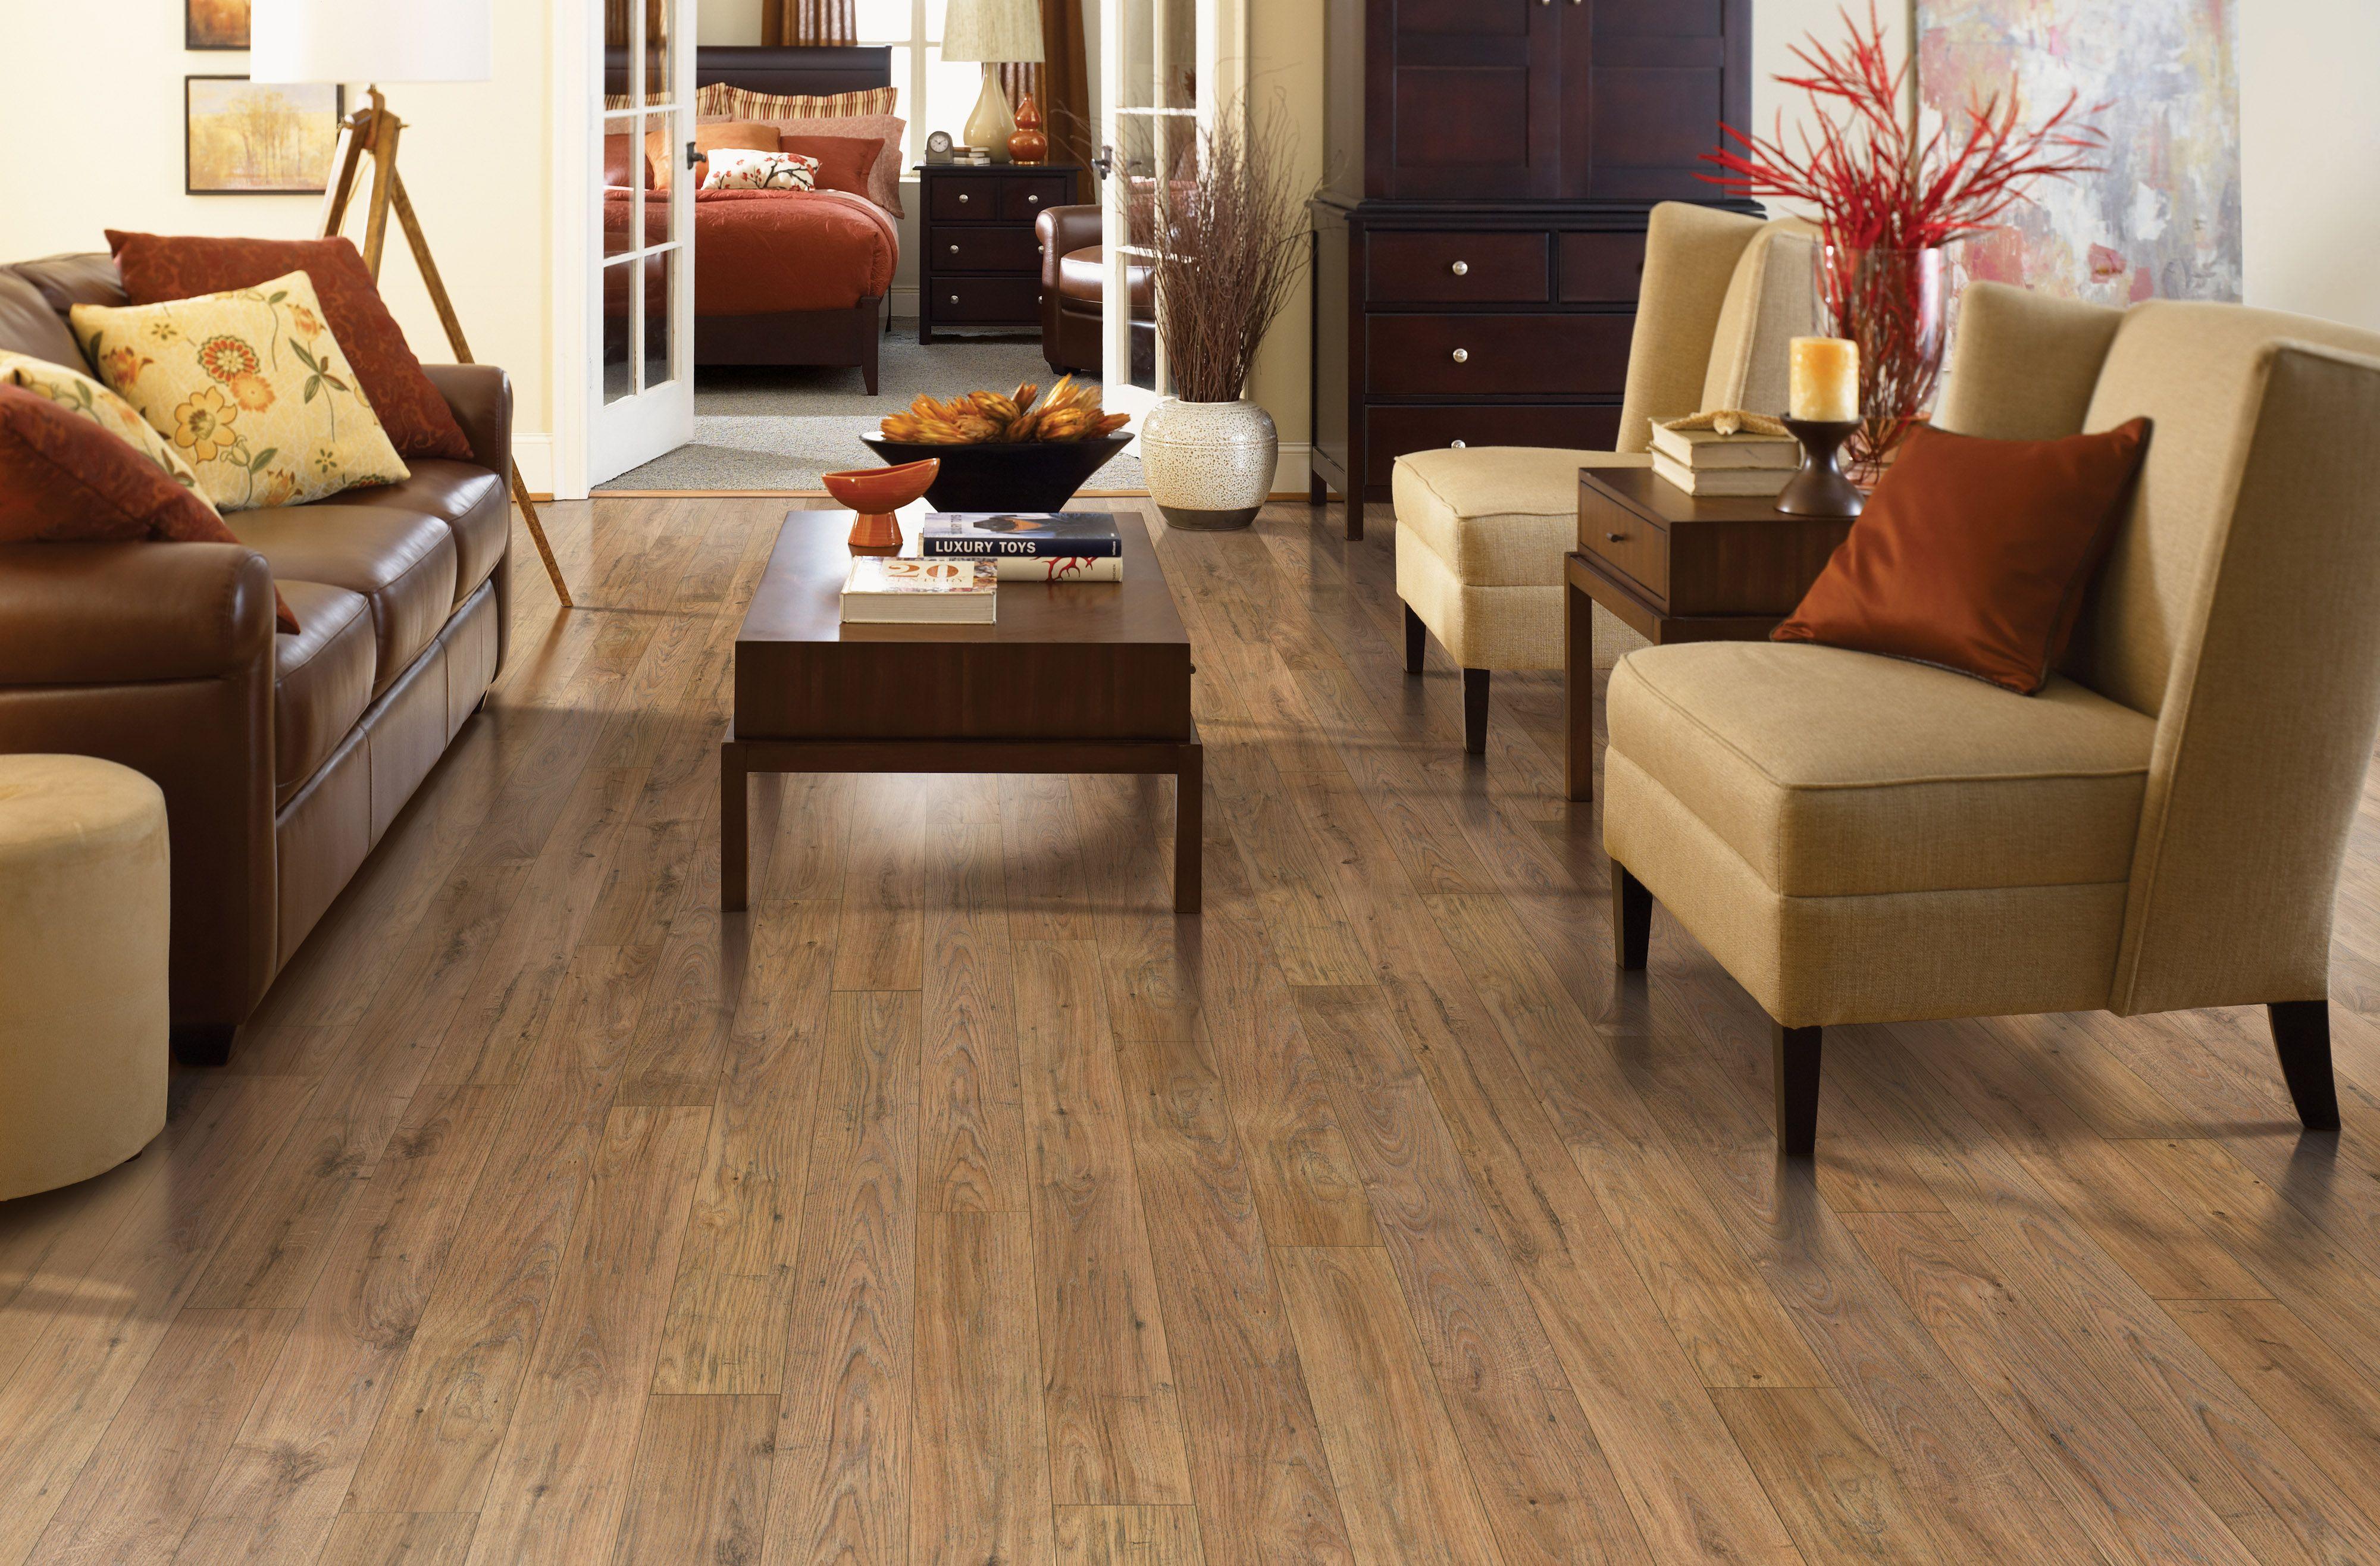 barrington laminate barnwood oak laminate flooring mohawk flooring flooring laminate laminate flooring pinterest oak laminate